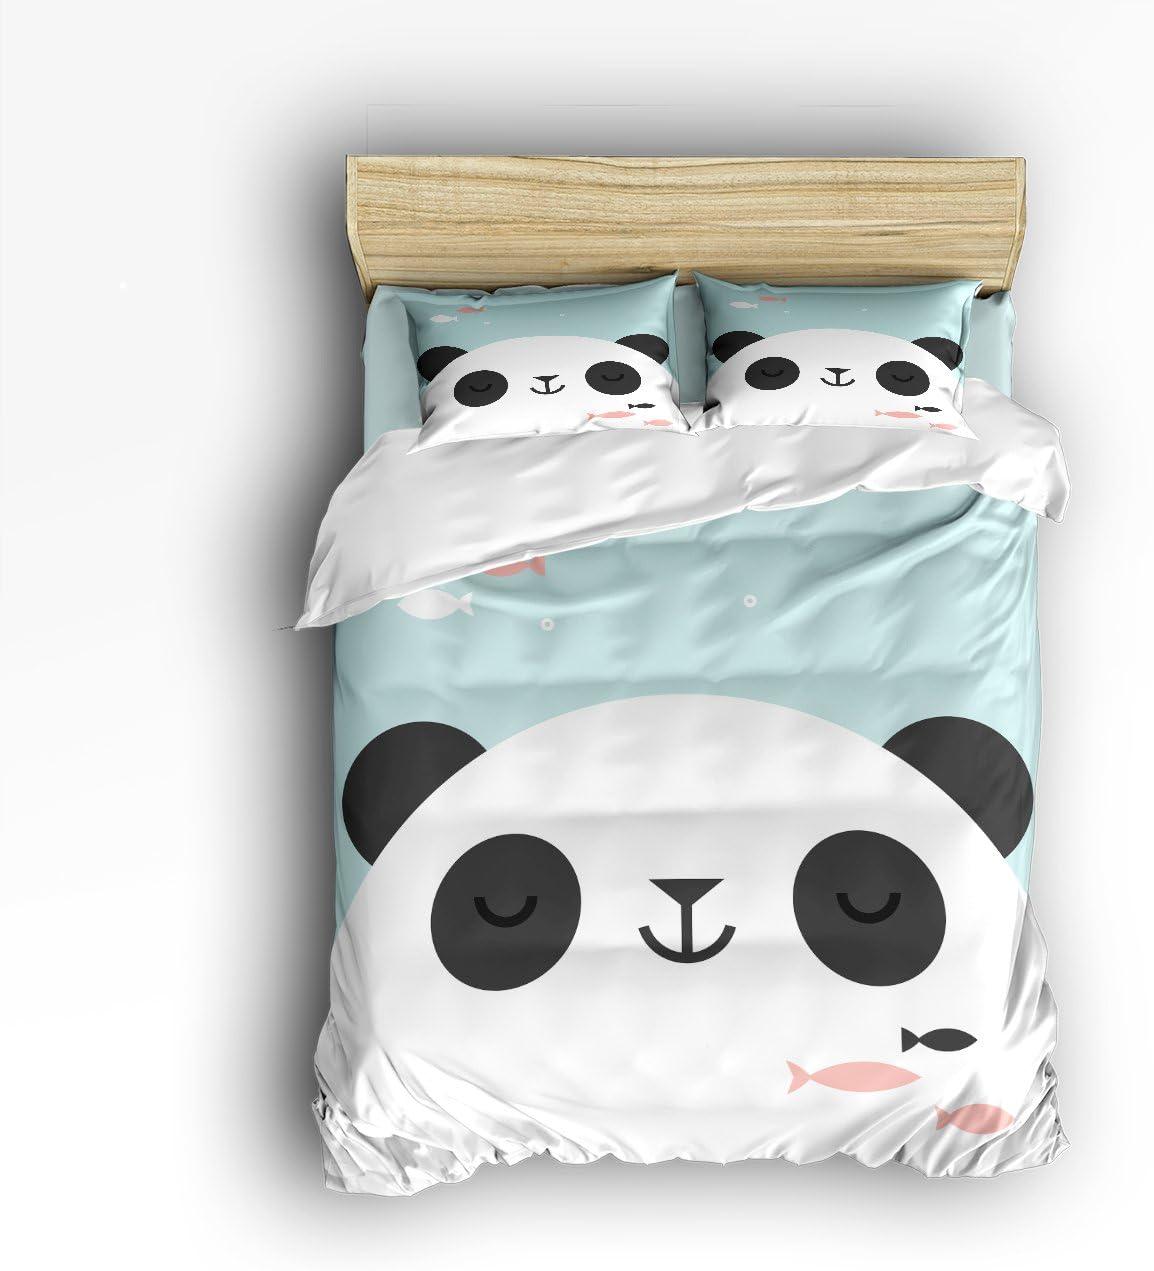 T&H Home Cute Panda Headshot for Kids Bedding Duvet Cover Set,4-Piece Suit Queen Size,100% Cotton Bed Sheets Set,Soft,Comfortable,Breathable